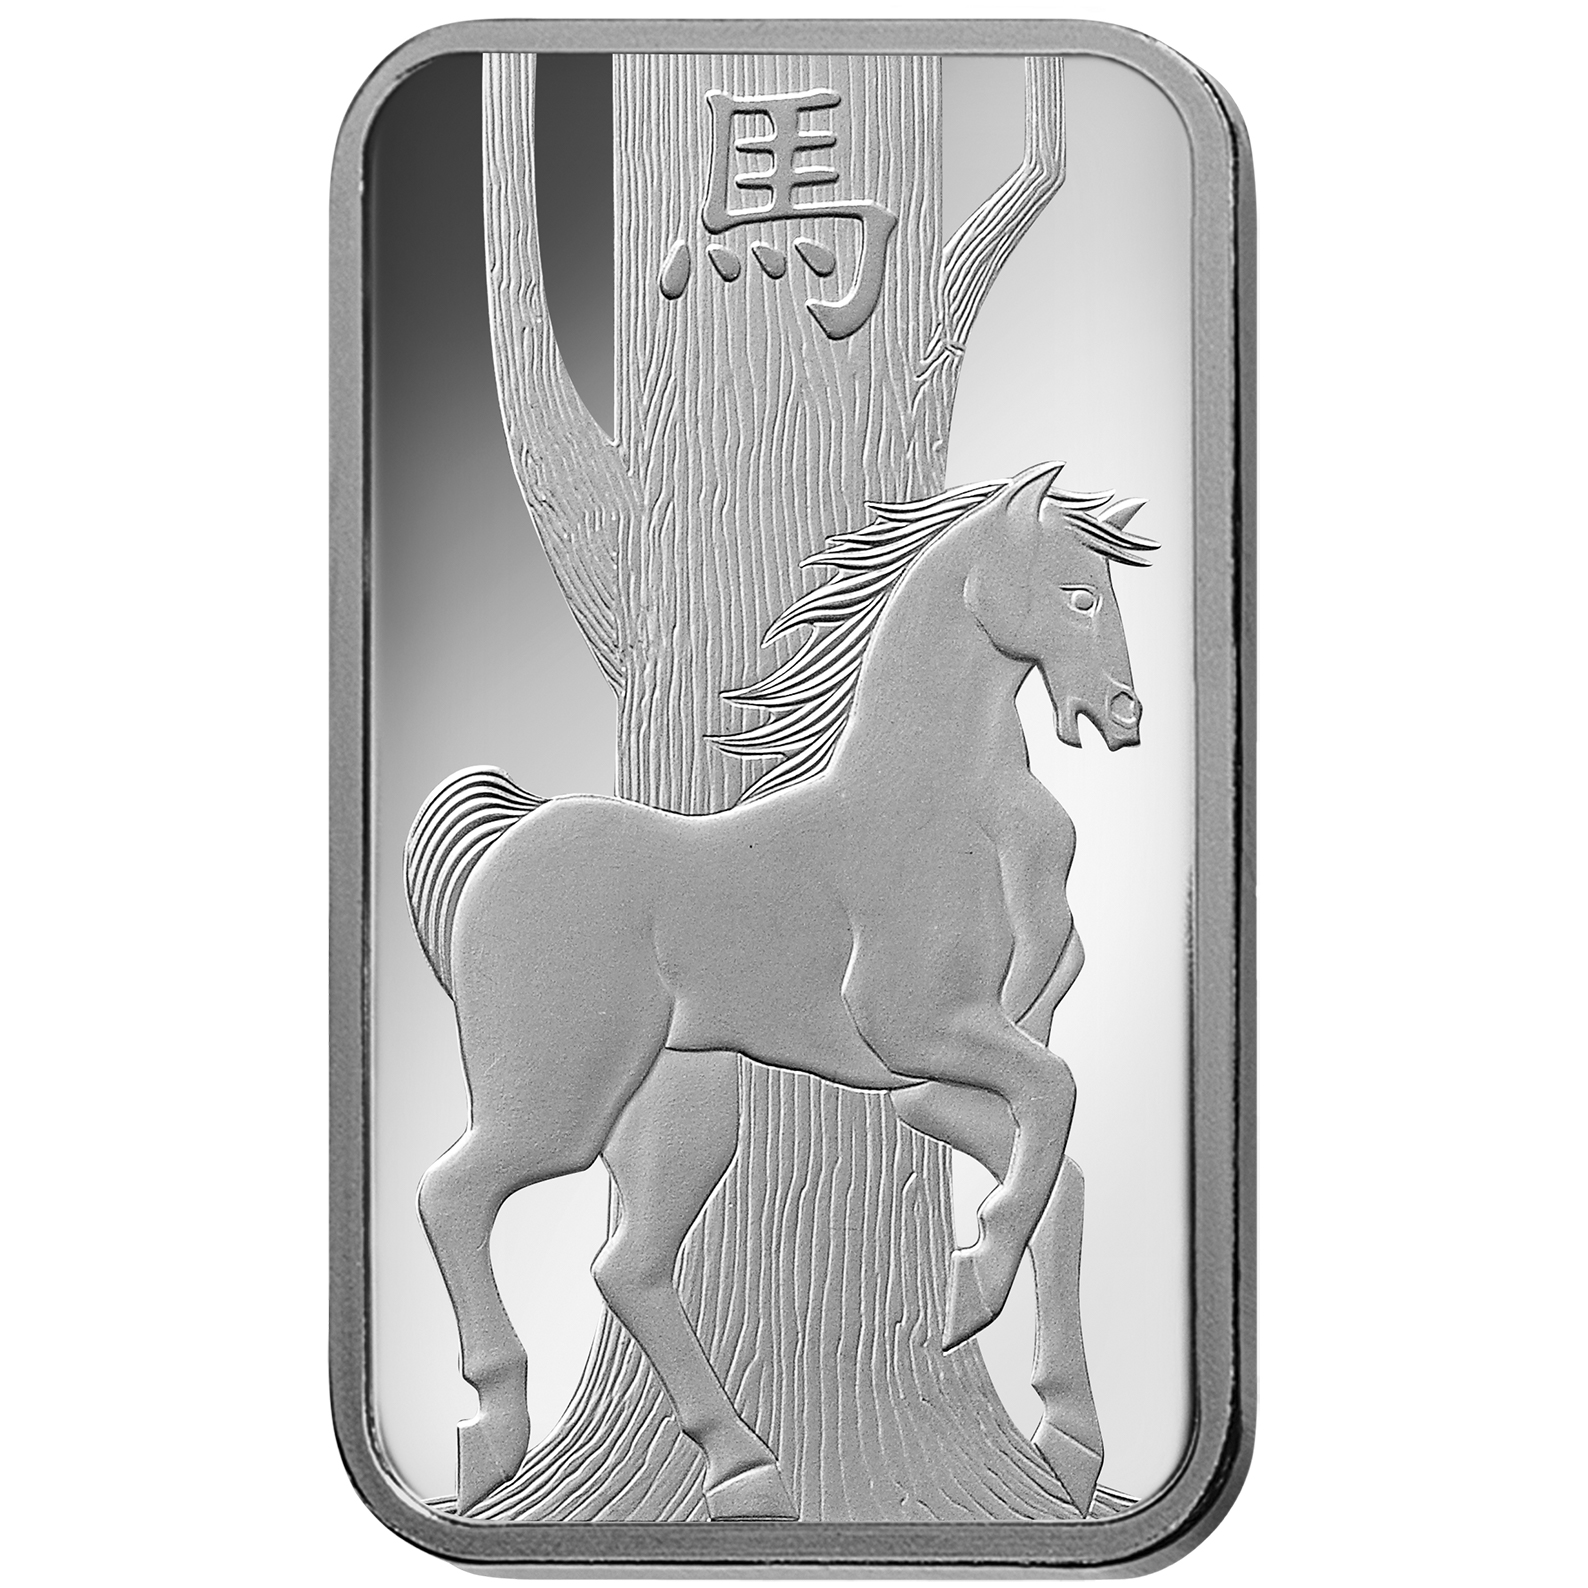 100 gram Fine Silver Bar 999.0 - PAMP Suisse Lunar Horse